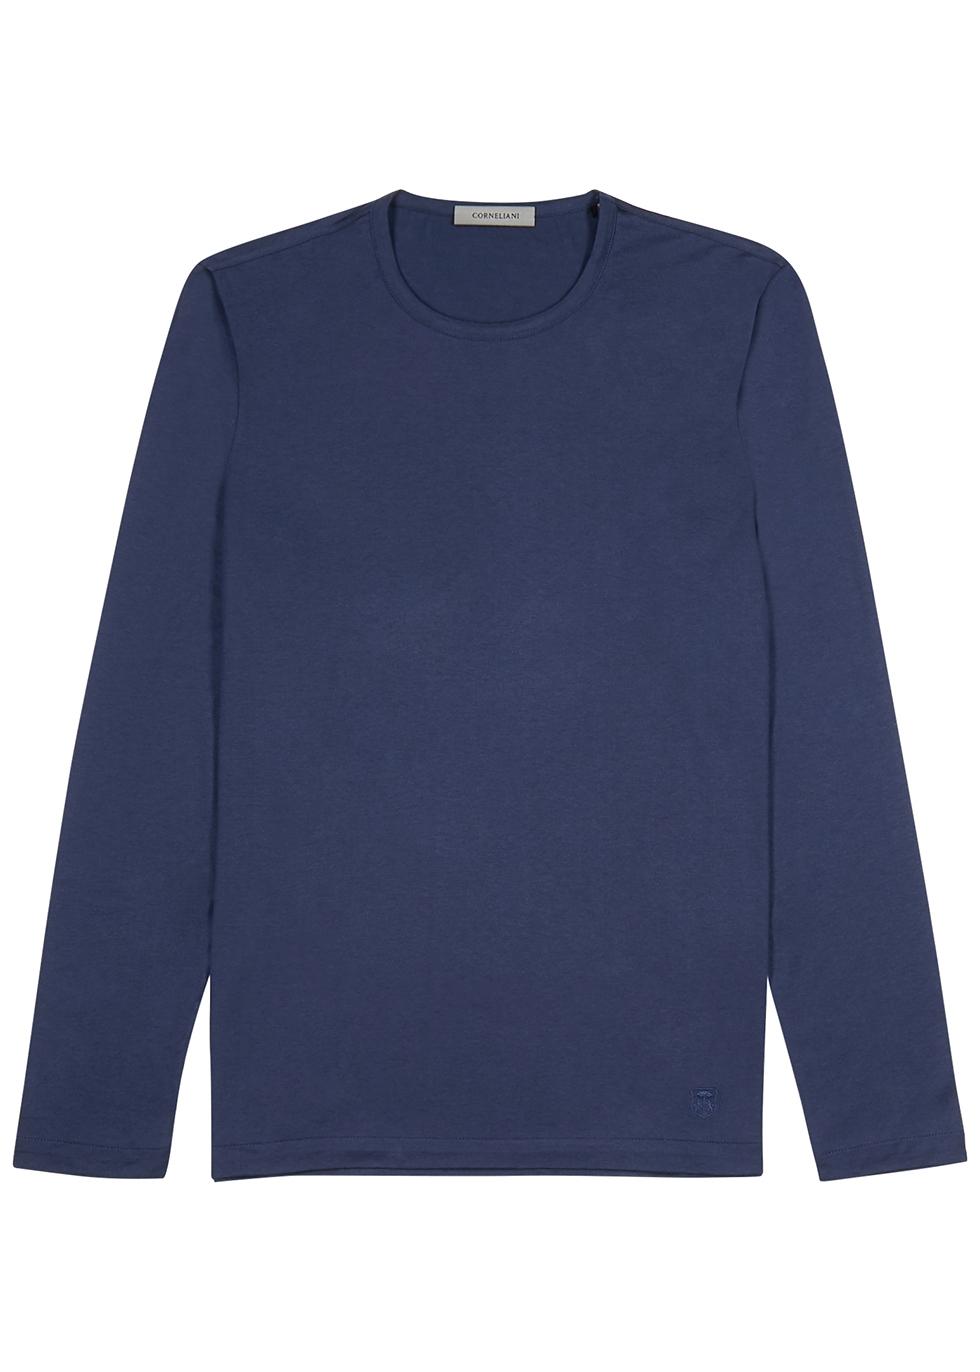 Blue silk jersey top - Corneliani